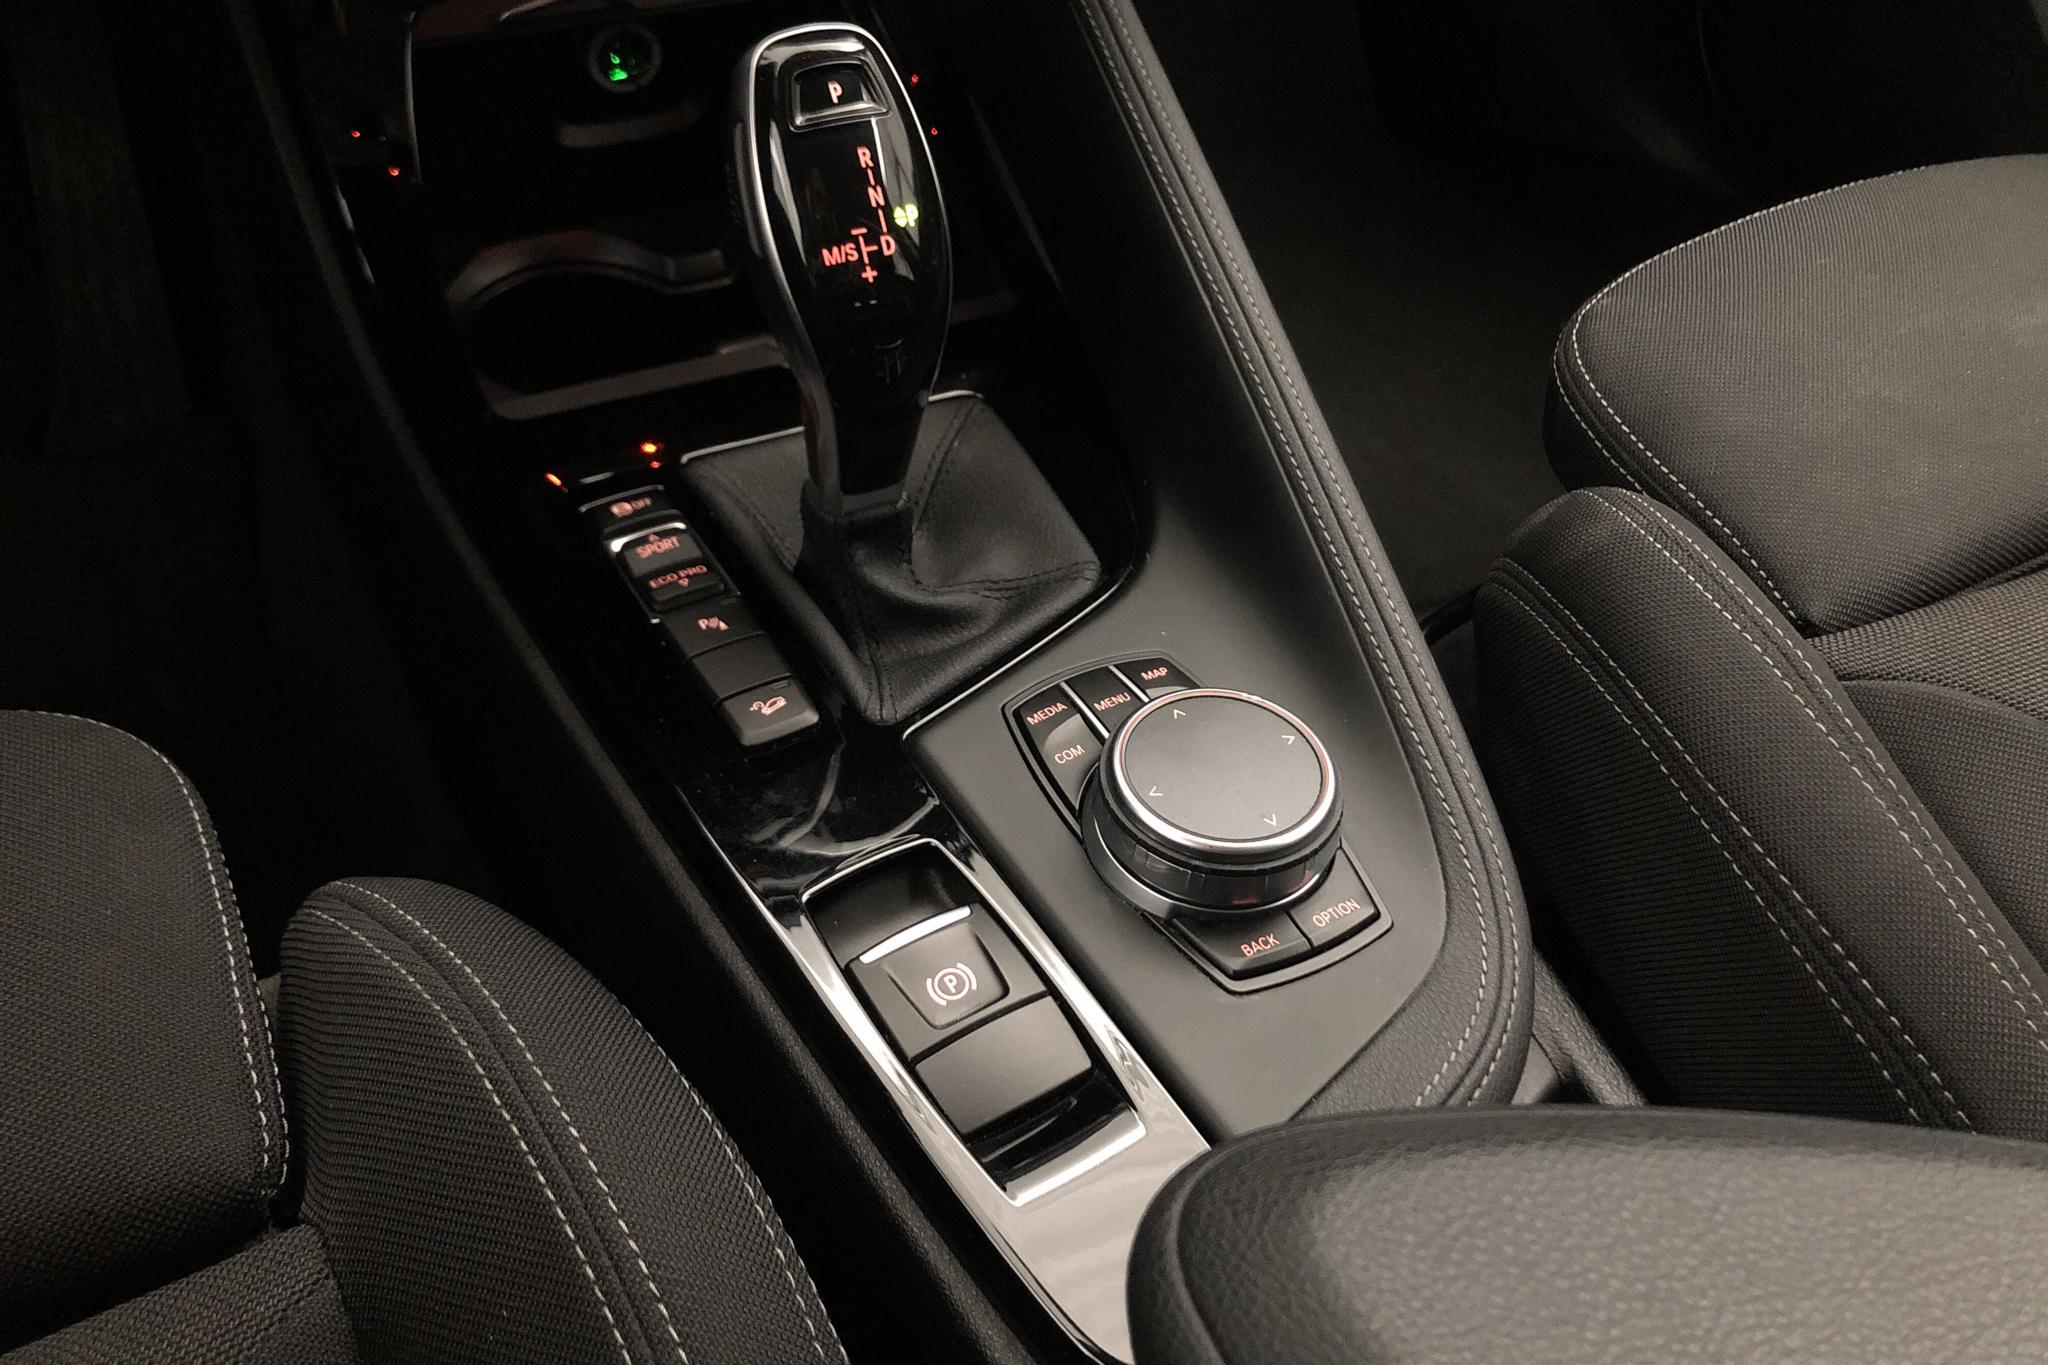 BMW X1 xDrive20d, F48 (190hk) - 68 370 km - Automatic - gray - 2018